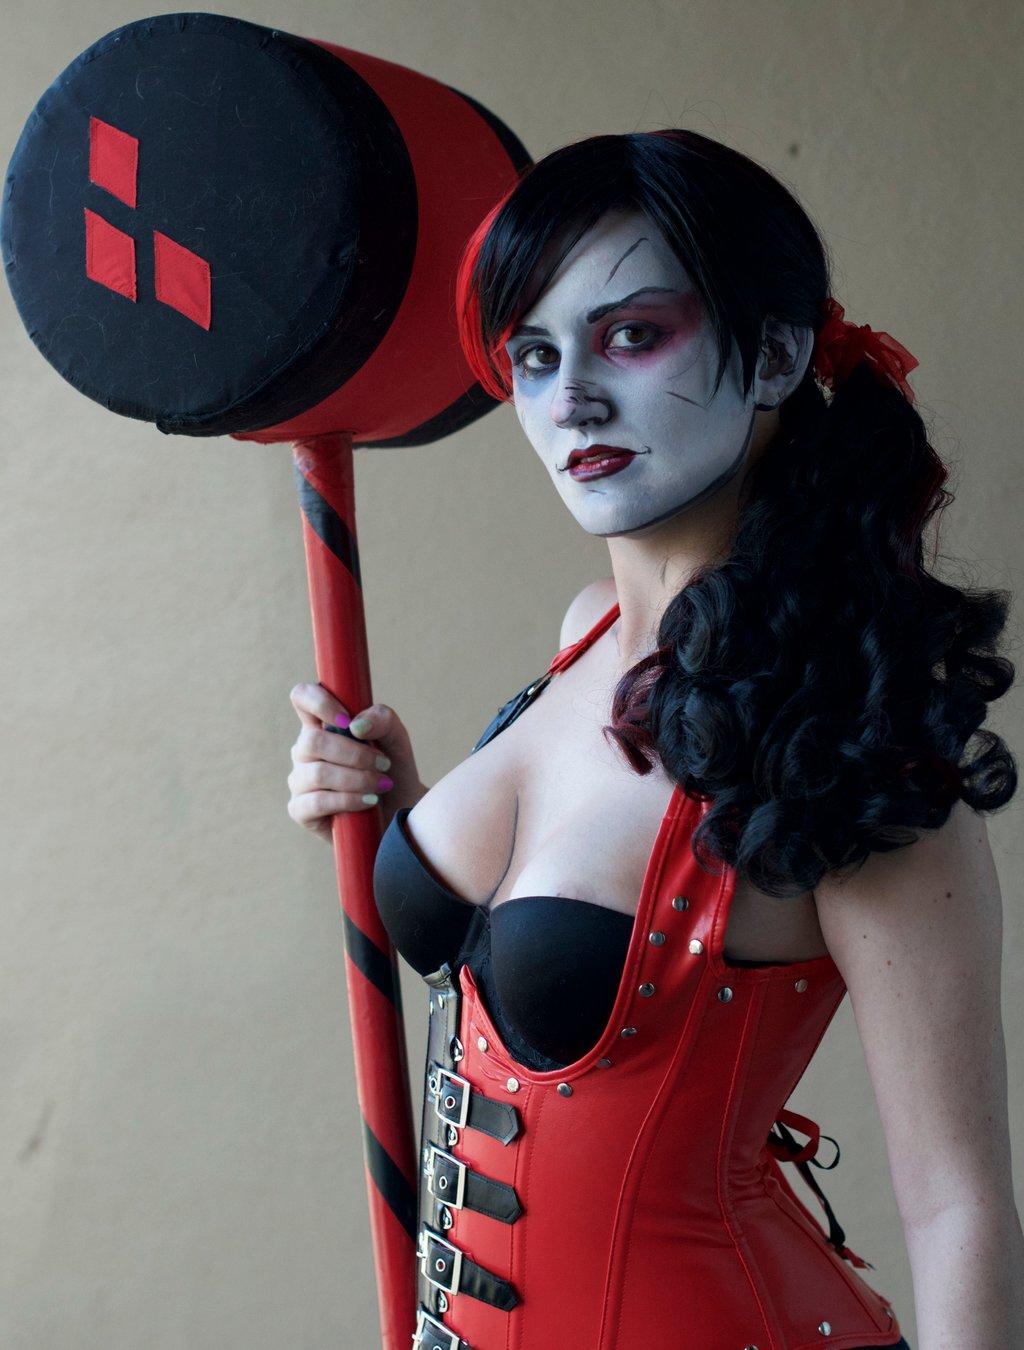 insane harley quin cosplay